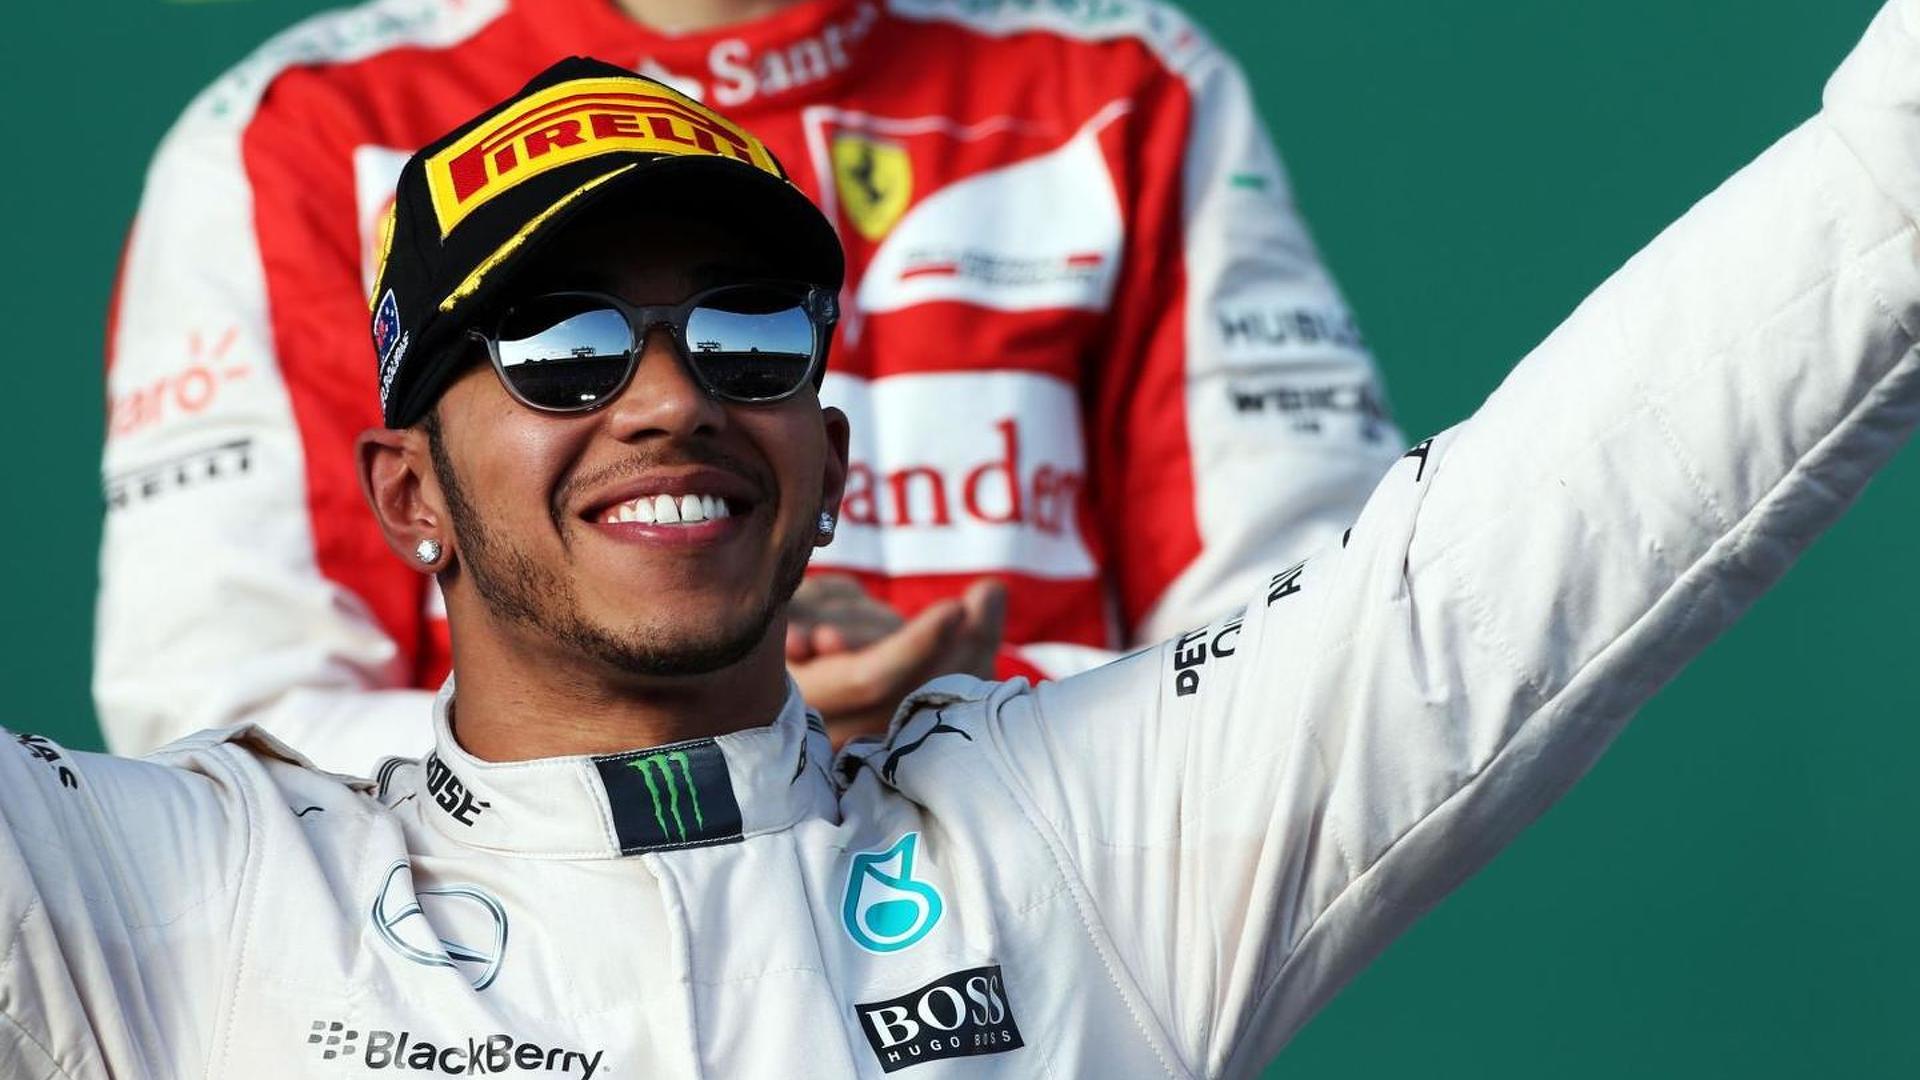 Wolff reveals Hamilton bought Ferrari supercar